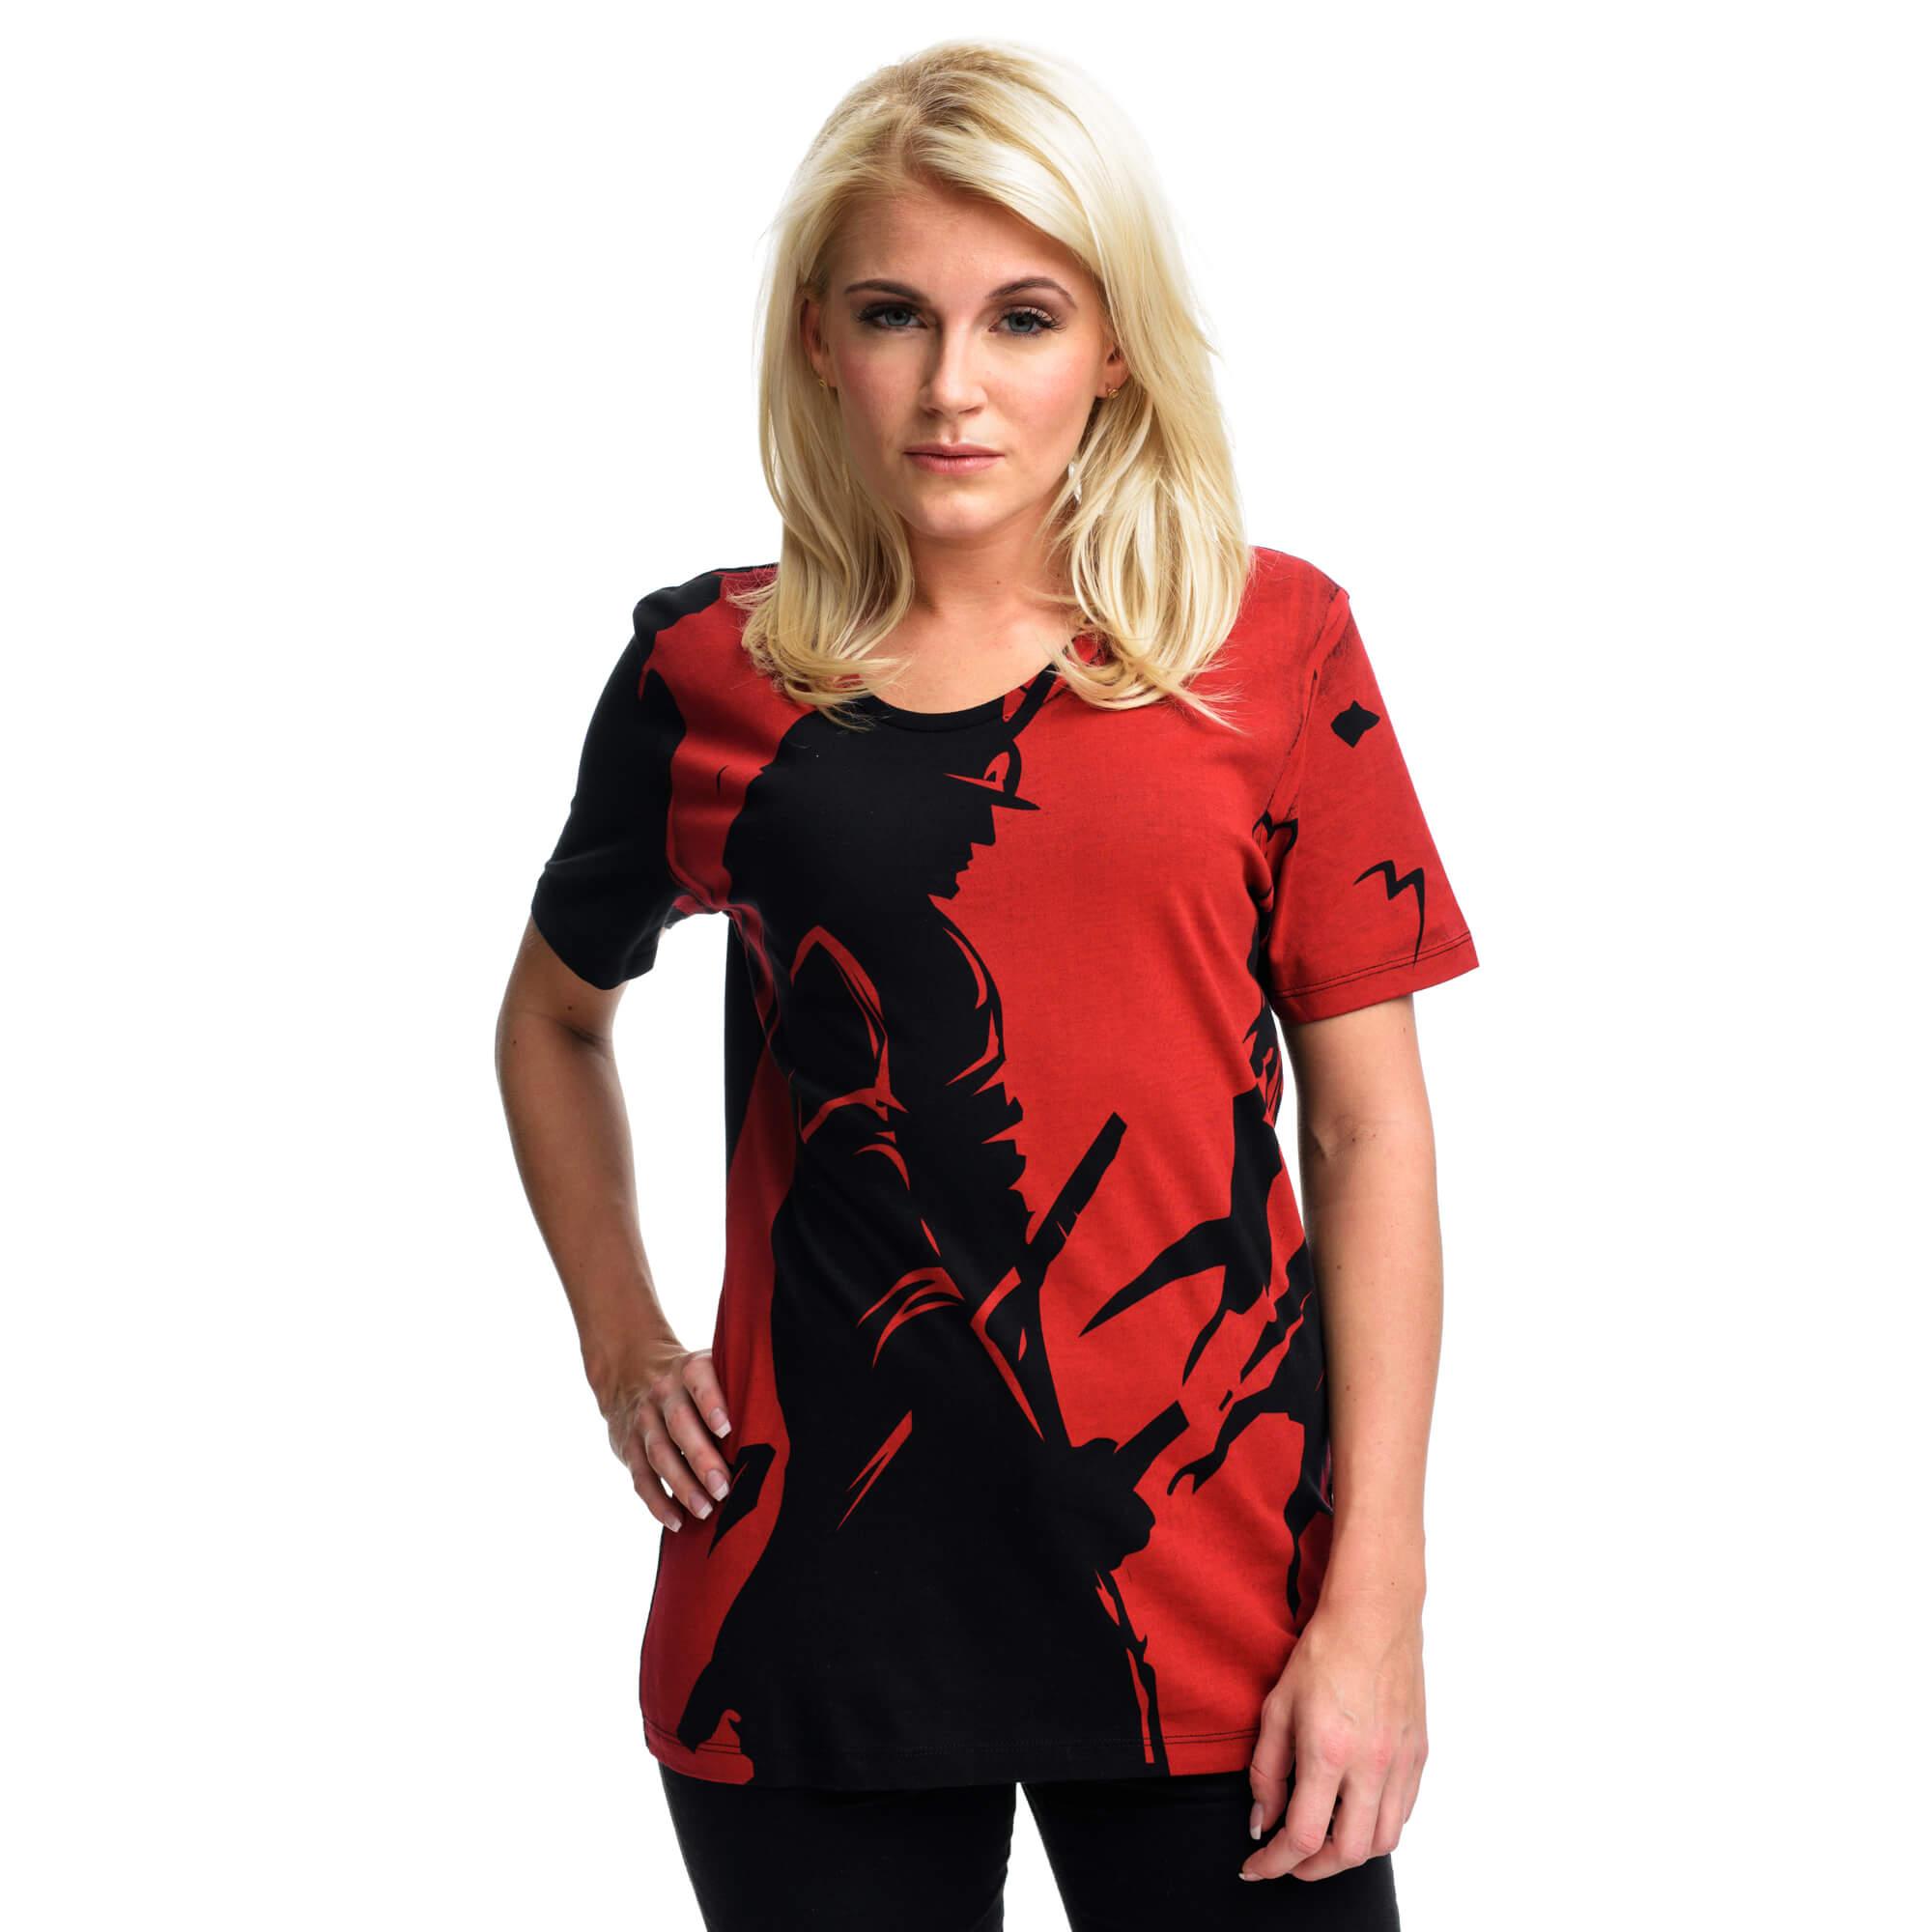 Loyal Samurai von Kontra K - Girlie Shirt jetzt im Bravado Shop